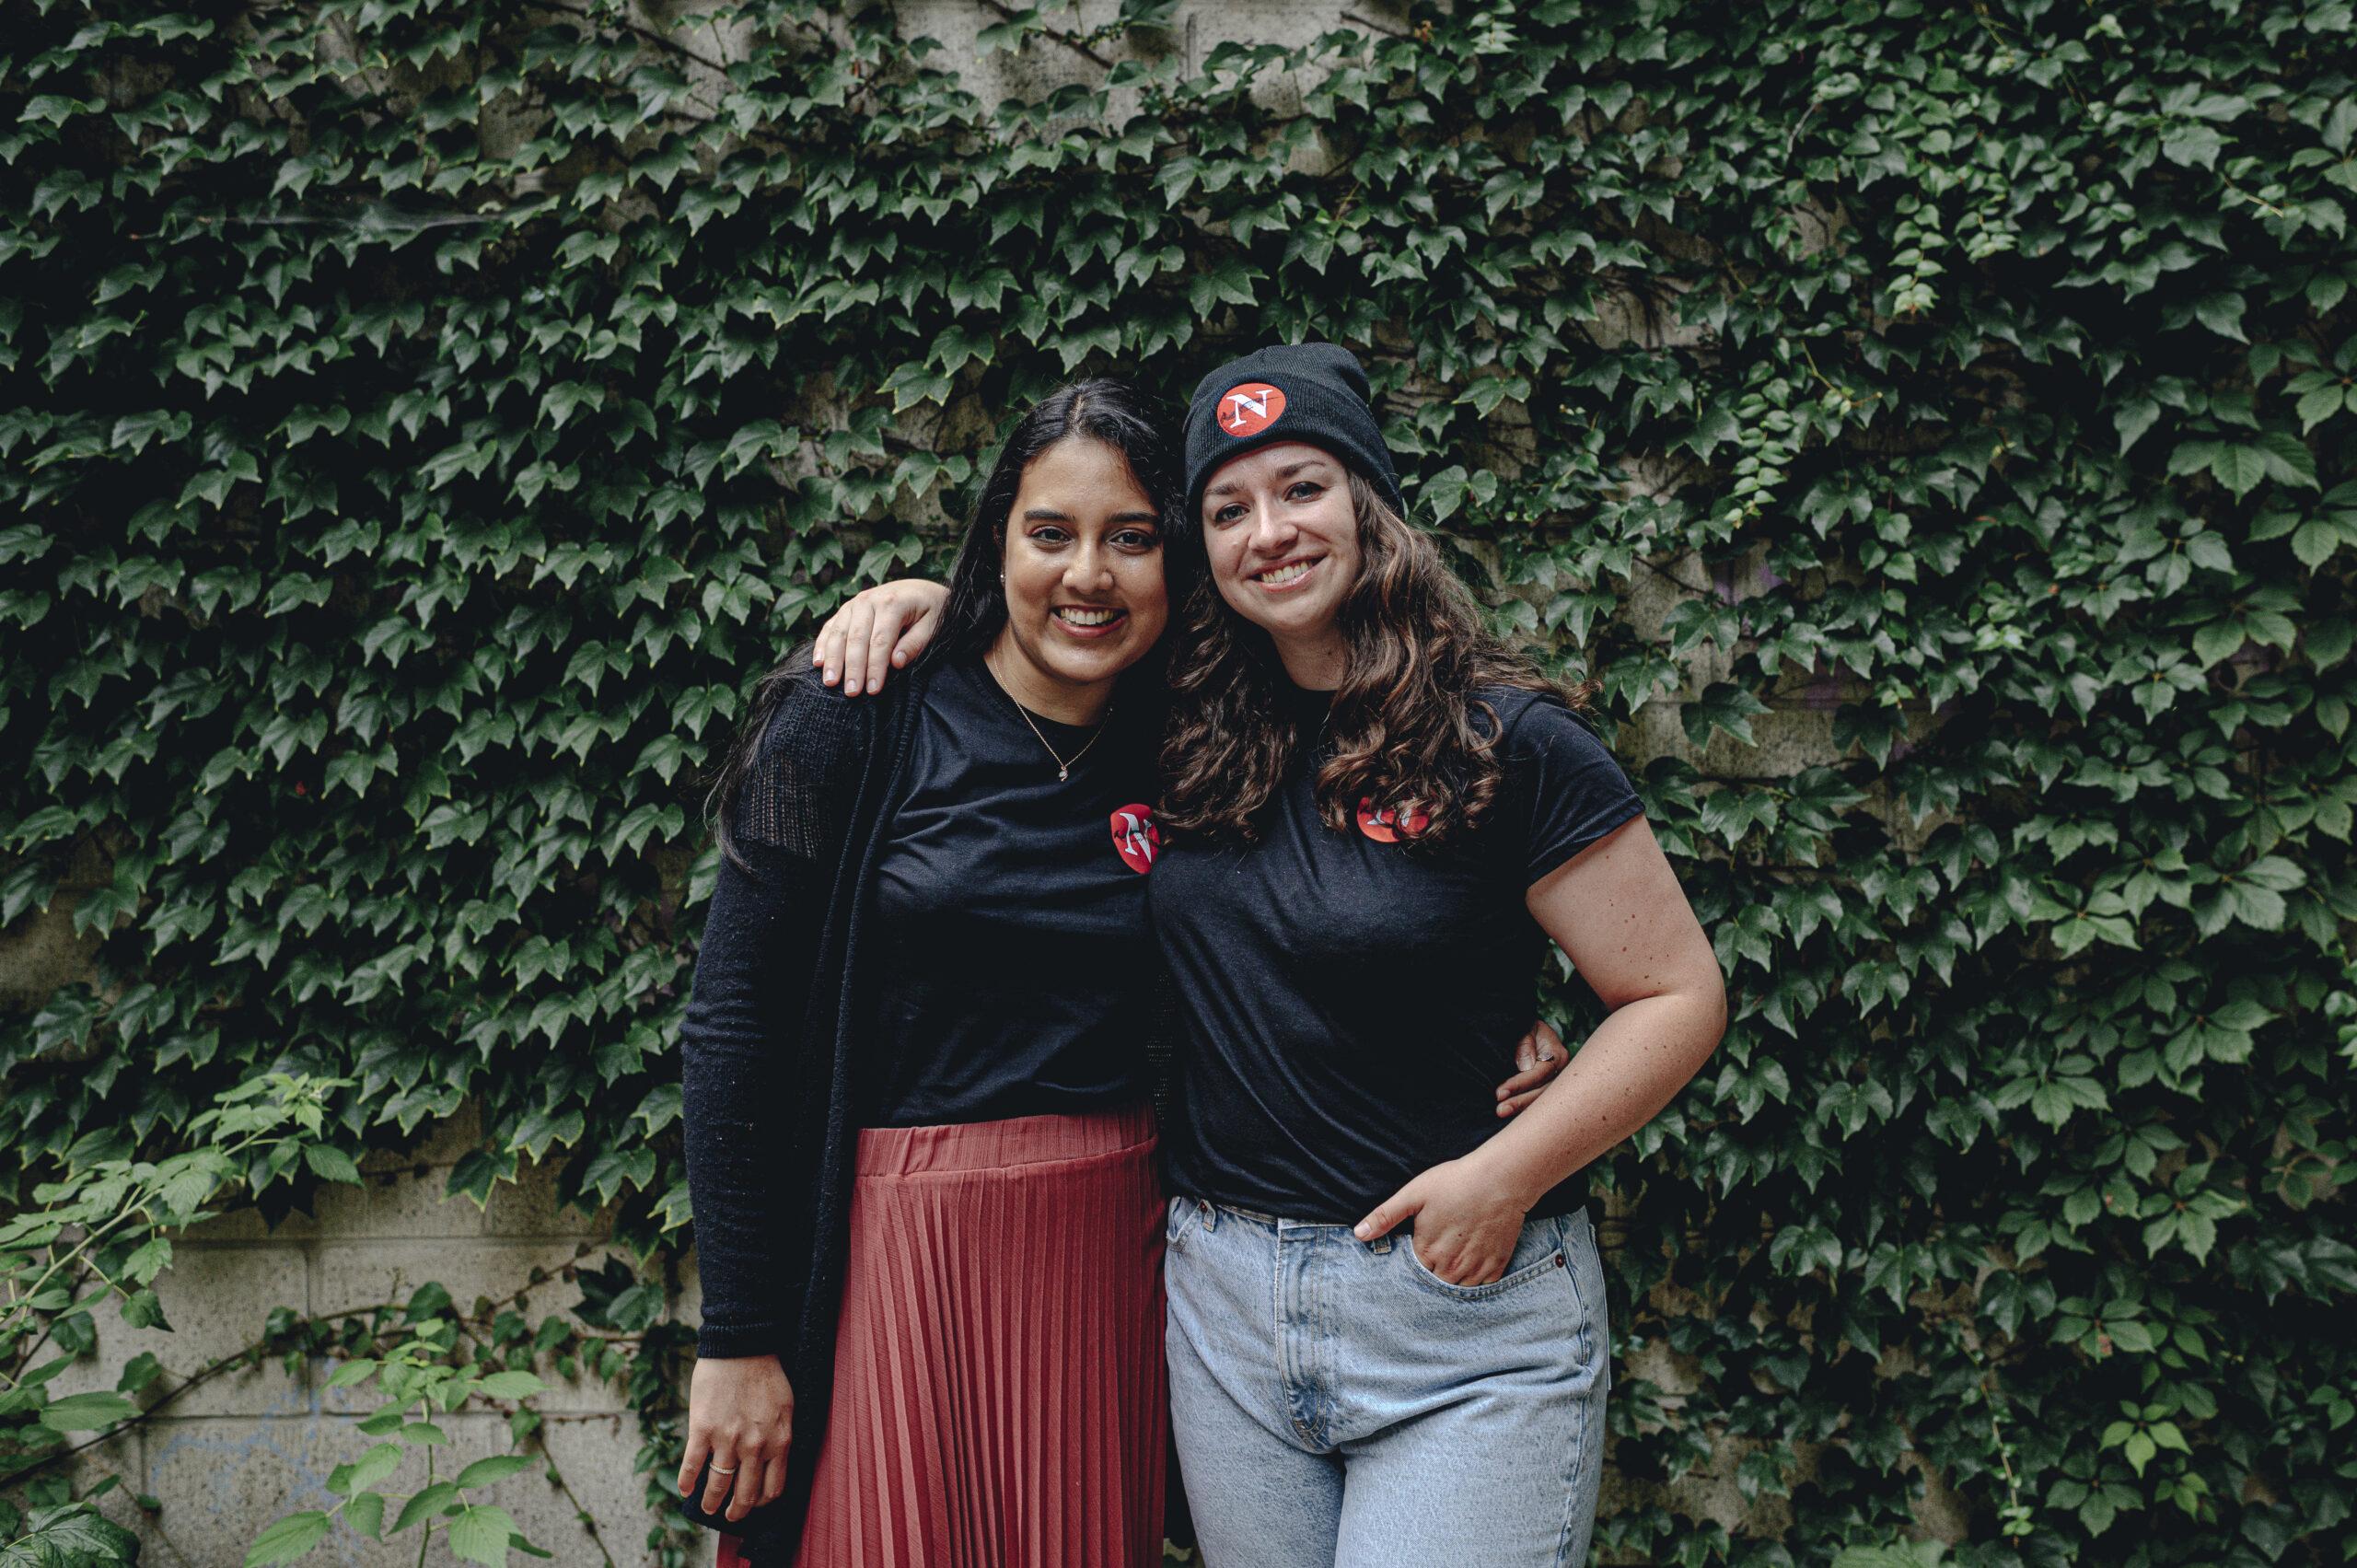 Fatima Syed and Emma McIntosh pose for a portrait